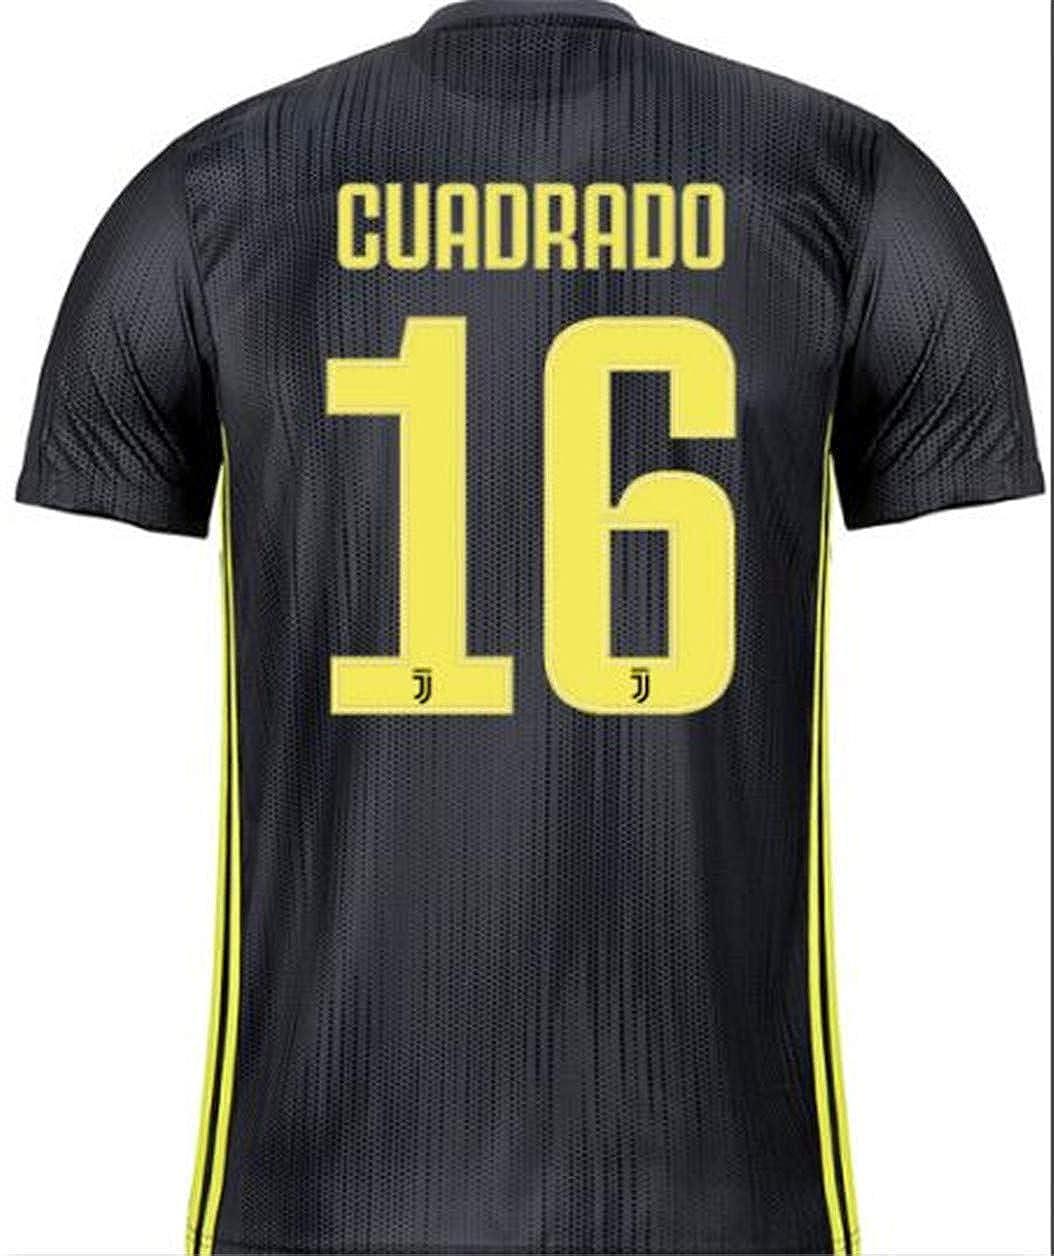 finest selection 96087 3f28b Amazon.com: LISIMKE Soccer Team Juventus Away Juan Cuadrado ...